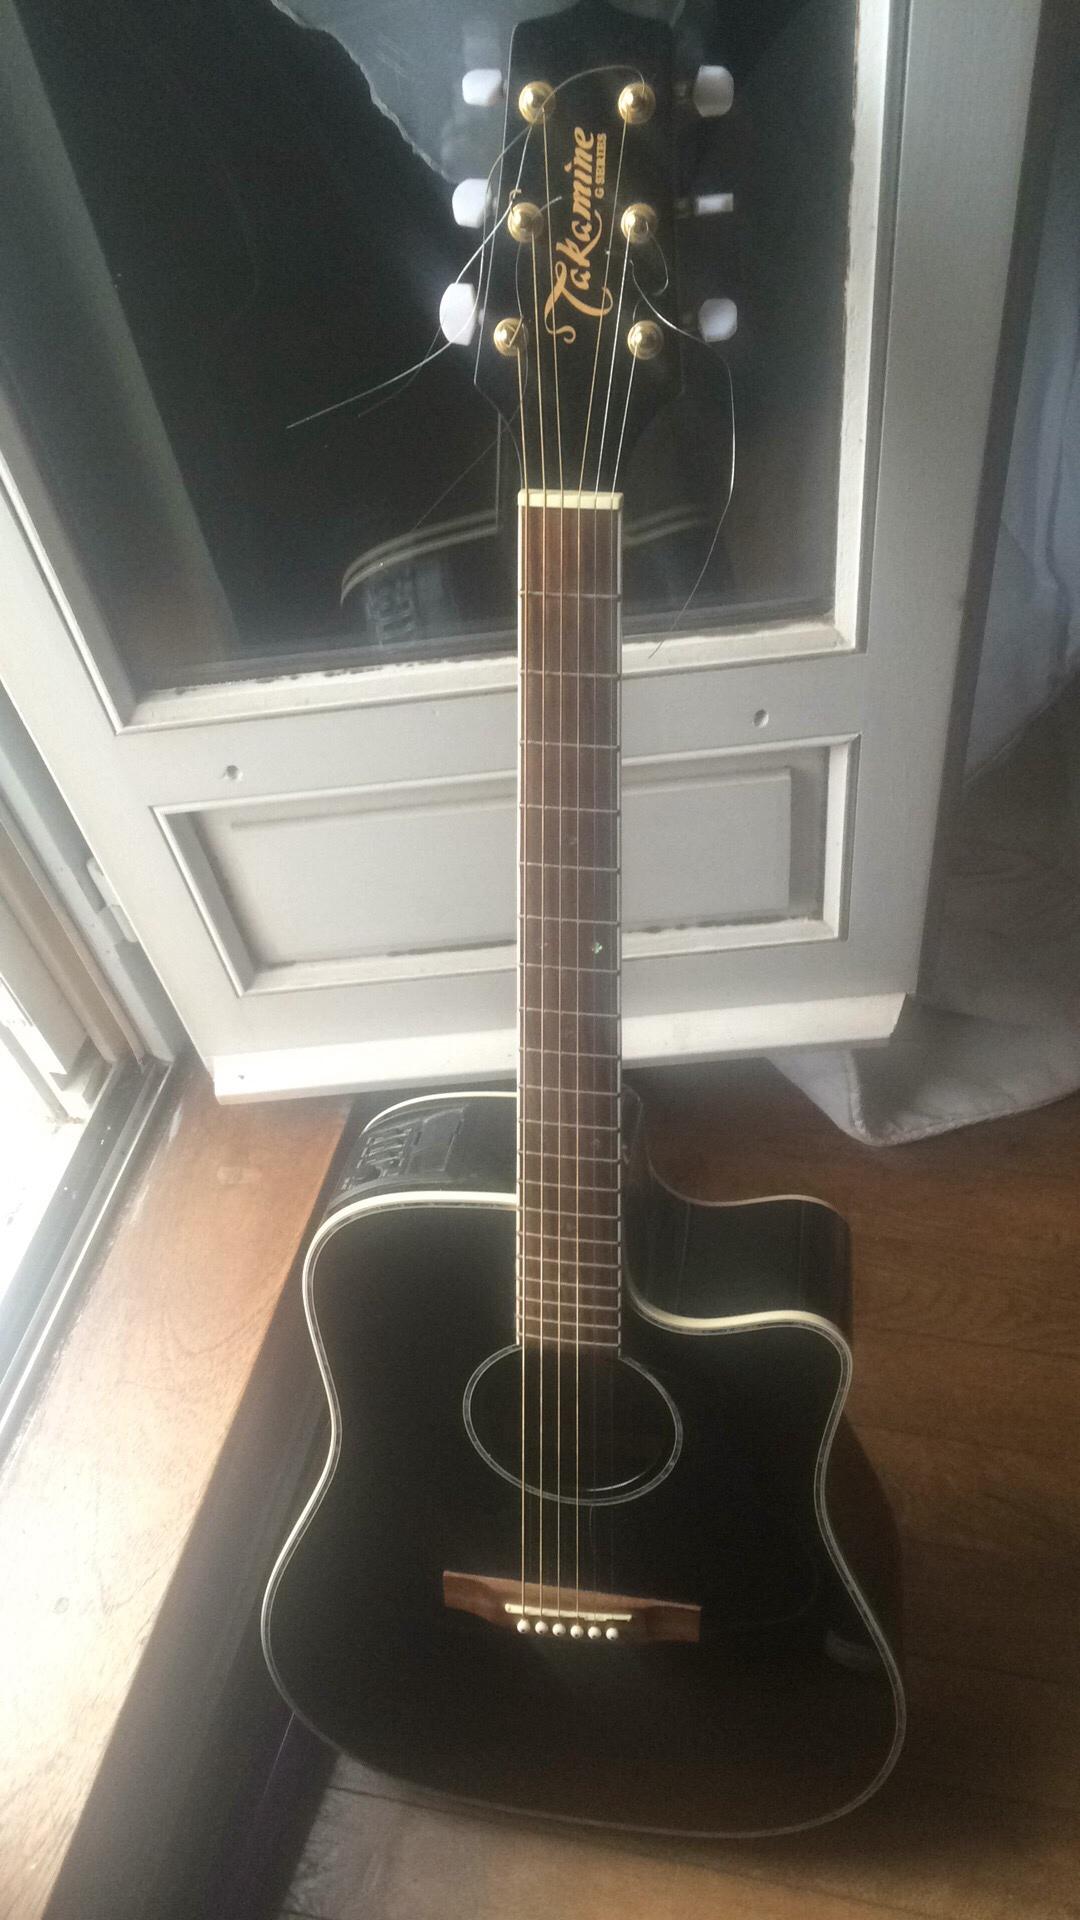 guitare takamine g séries 0 Royan (17)